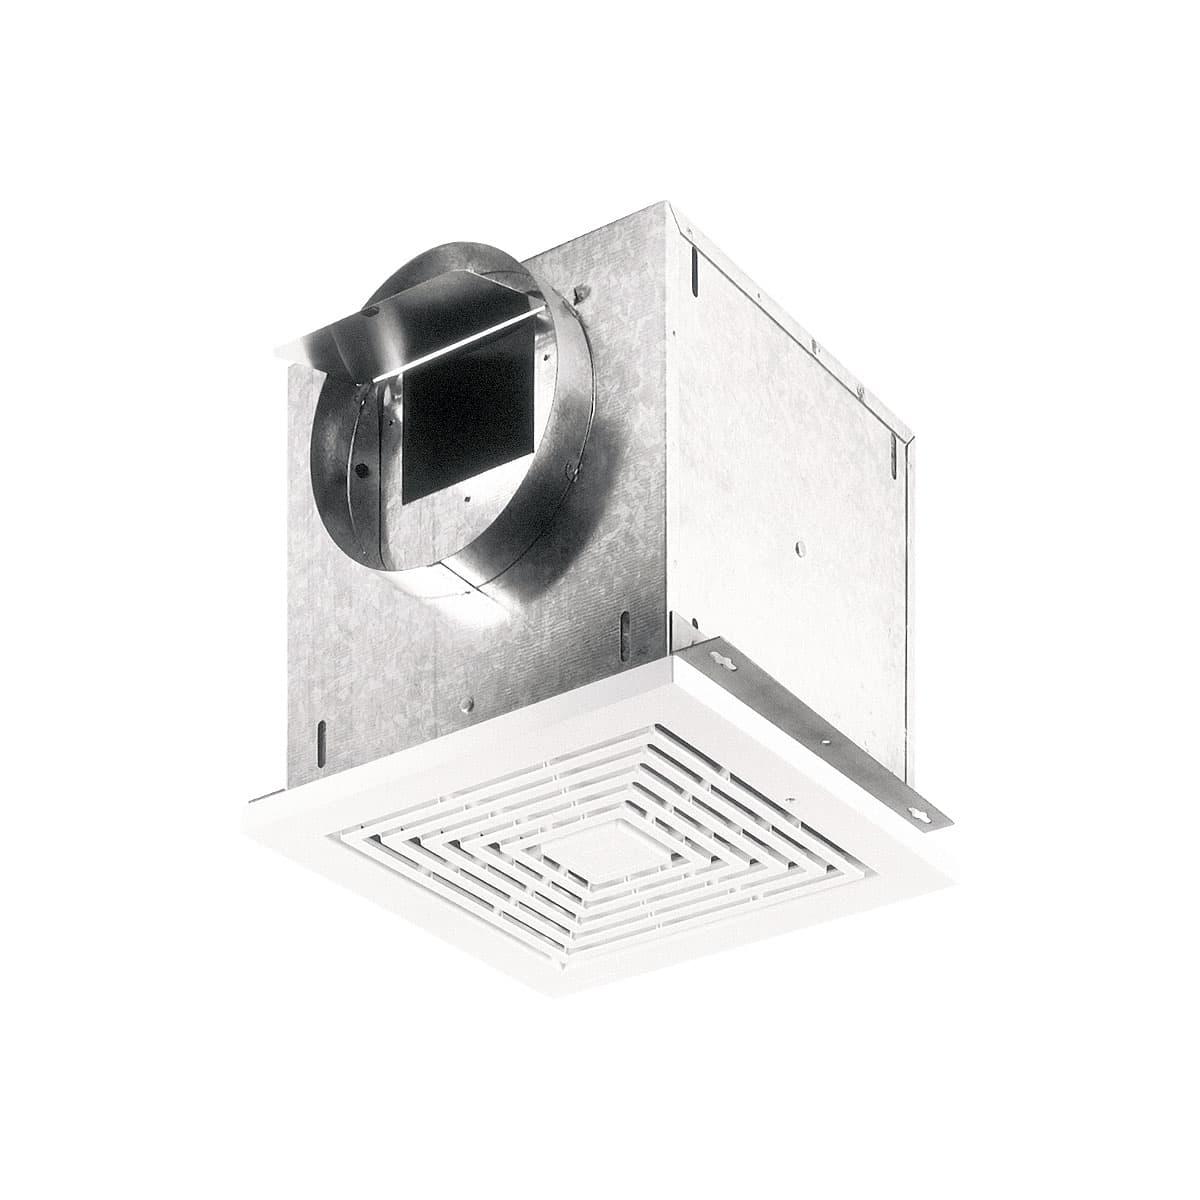 Broan 100 Cfm Ceiling Exhaust Fan With Light 696: Broan 109 CFM High Capacity Ceiling Mount Ventilation Fan